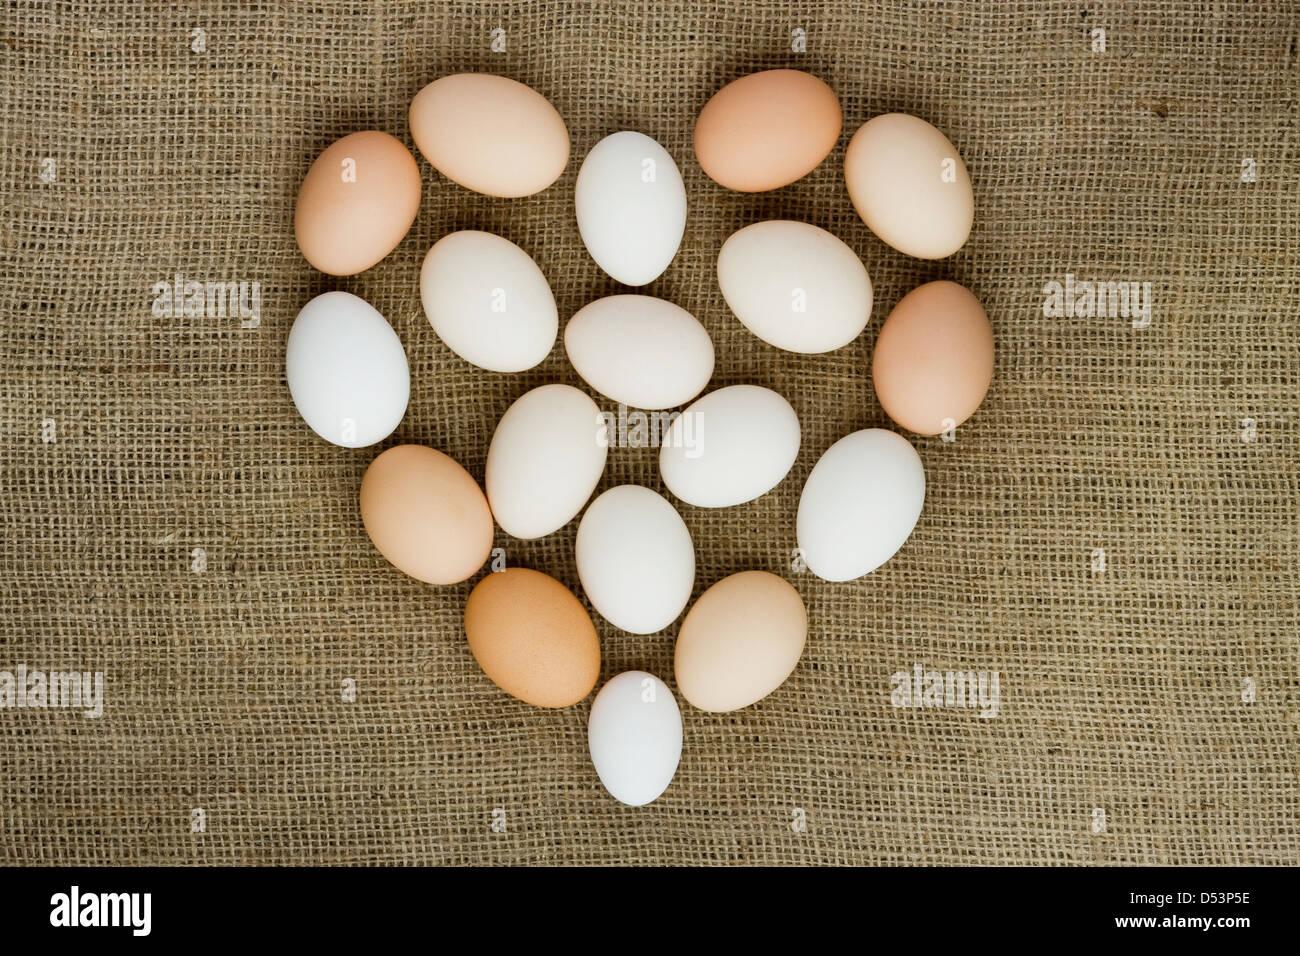 Fresh eggs from farm, heart shape - Stock Image